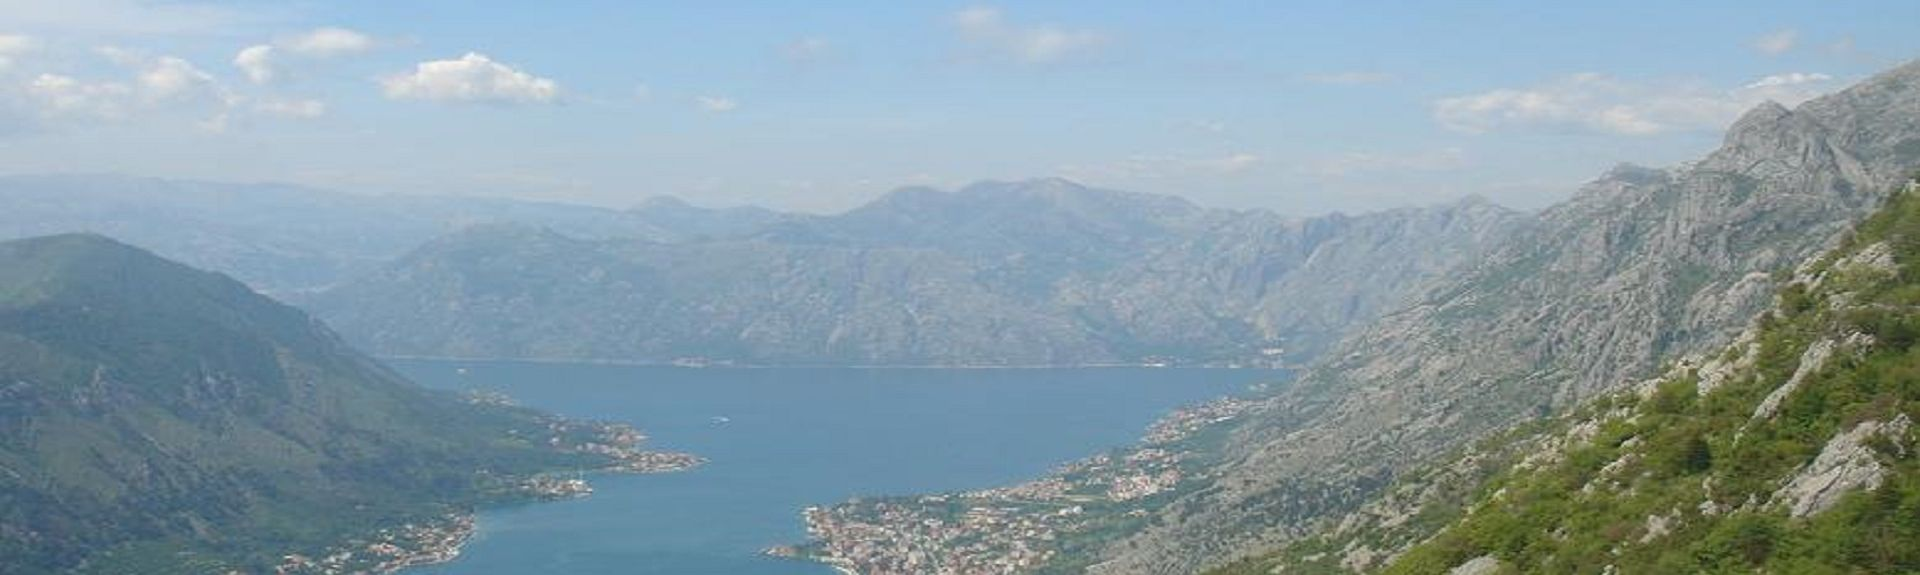 Kotor, Verwaltungsbezirk Kotor, Montenegro